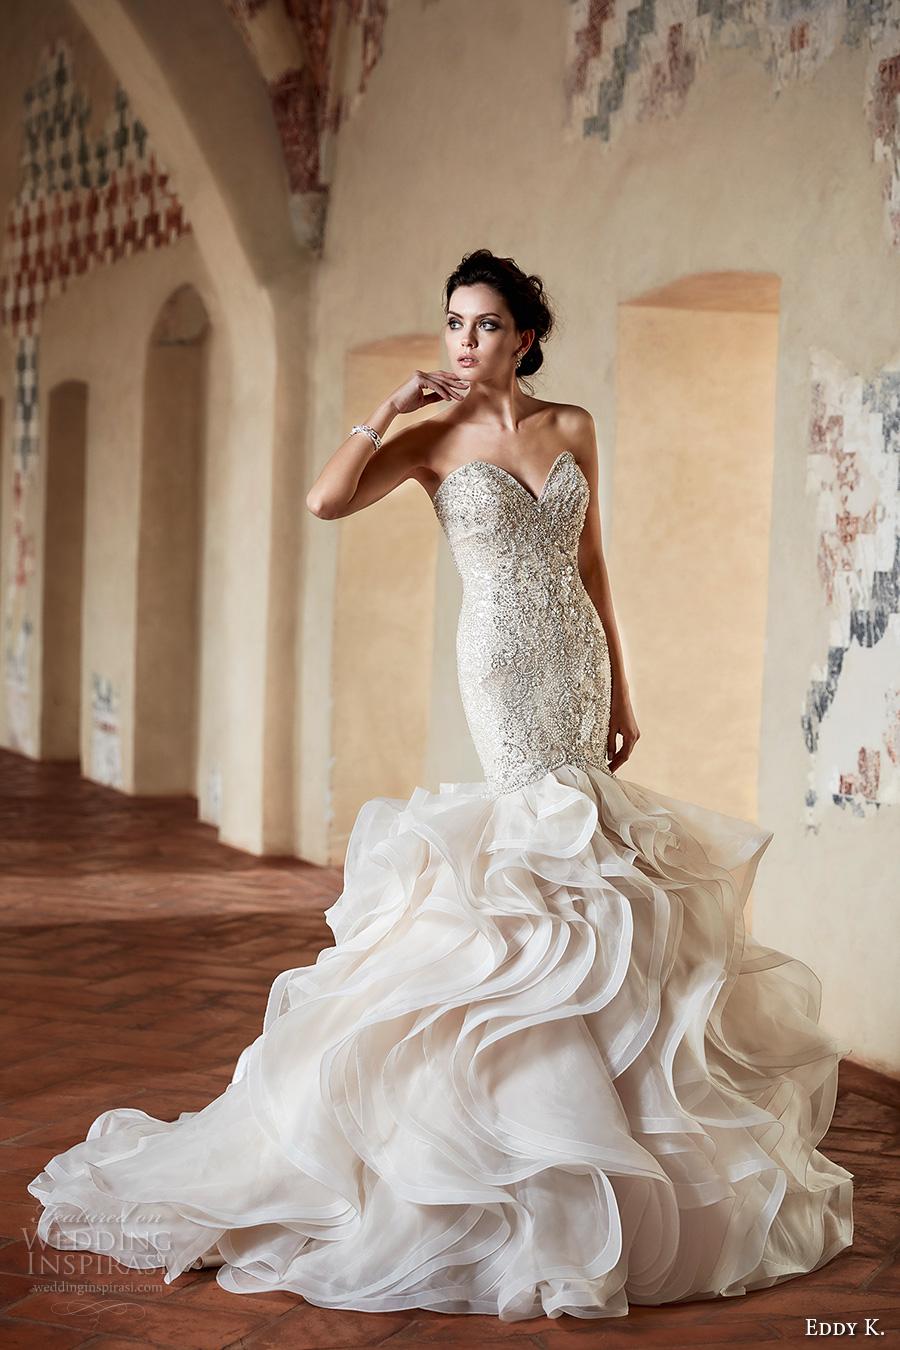 6a2b94bb8 eddy k couture 2017 bridal strapless sweetheart neckline heavily  embellished bodice layered skirt elegant sexy glamorous